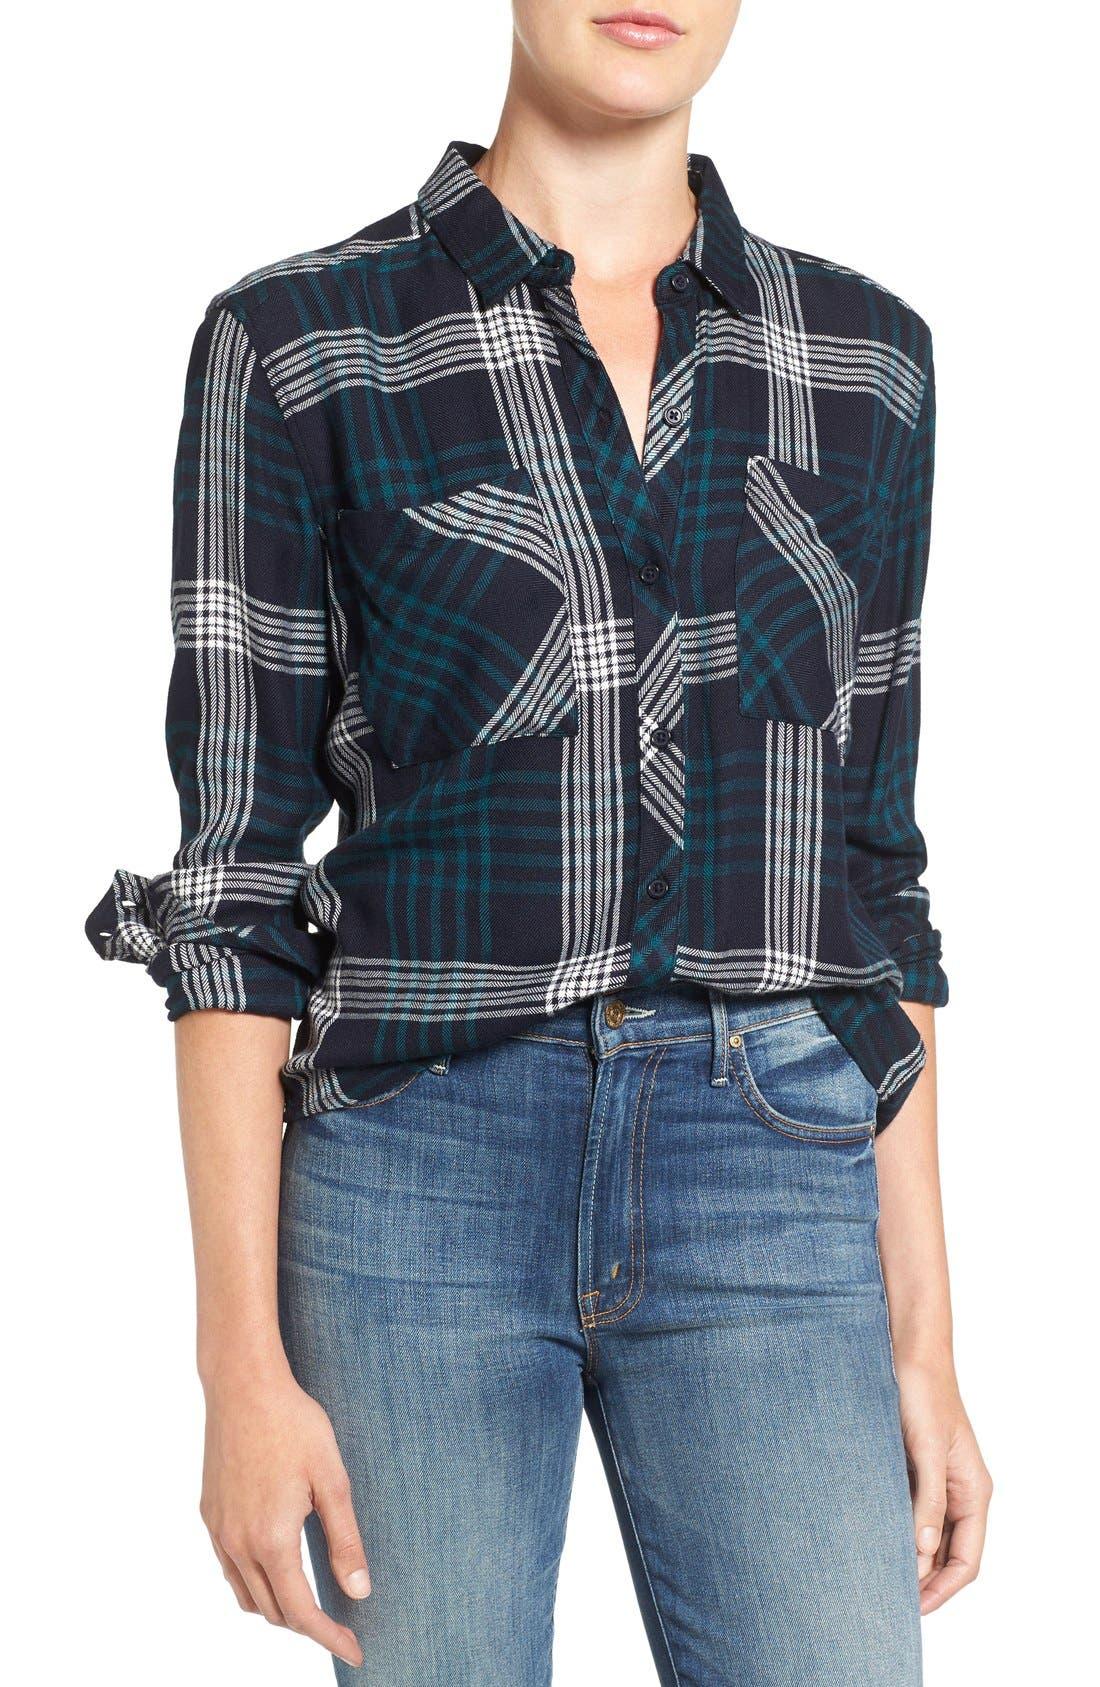 Alternate Image 1 Selected - Rails 'Dylan' Plaid Shirt